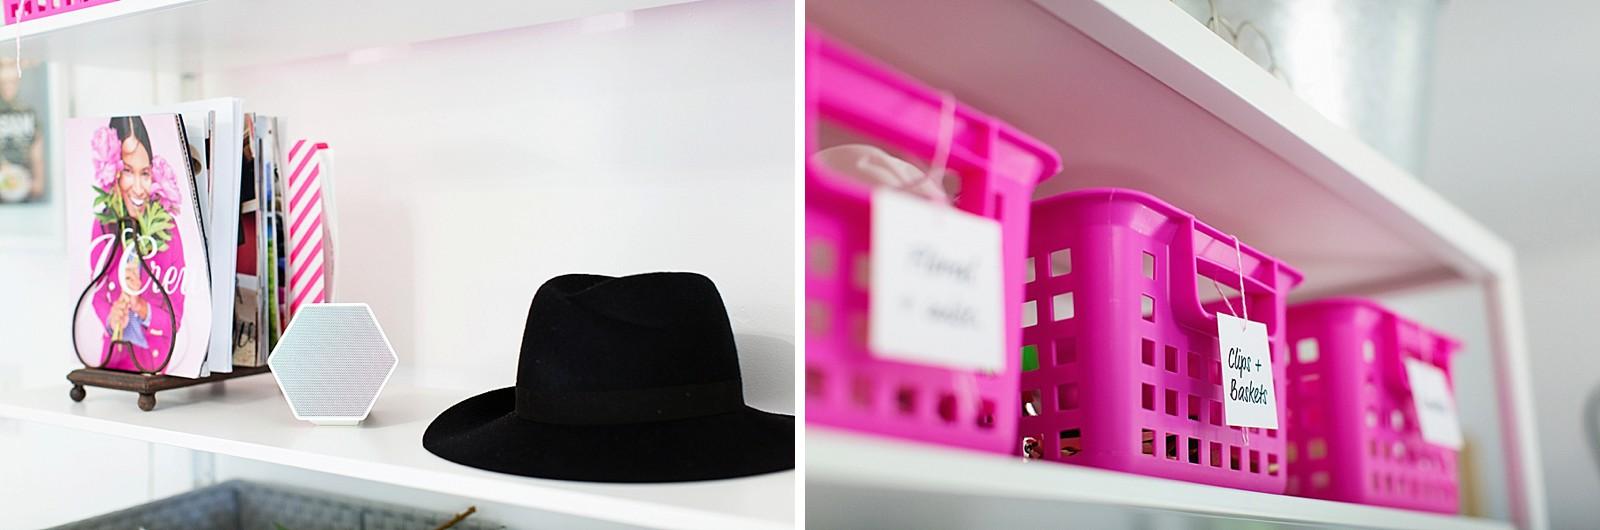 home-photography-studio-storage-tour-photographer-blogger-arizona-diana-elizabeth-blog-1946